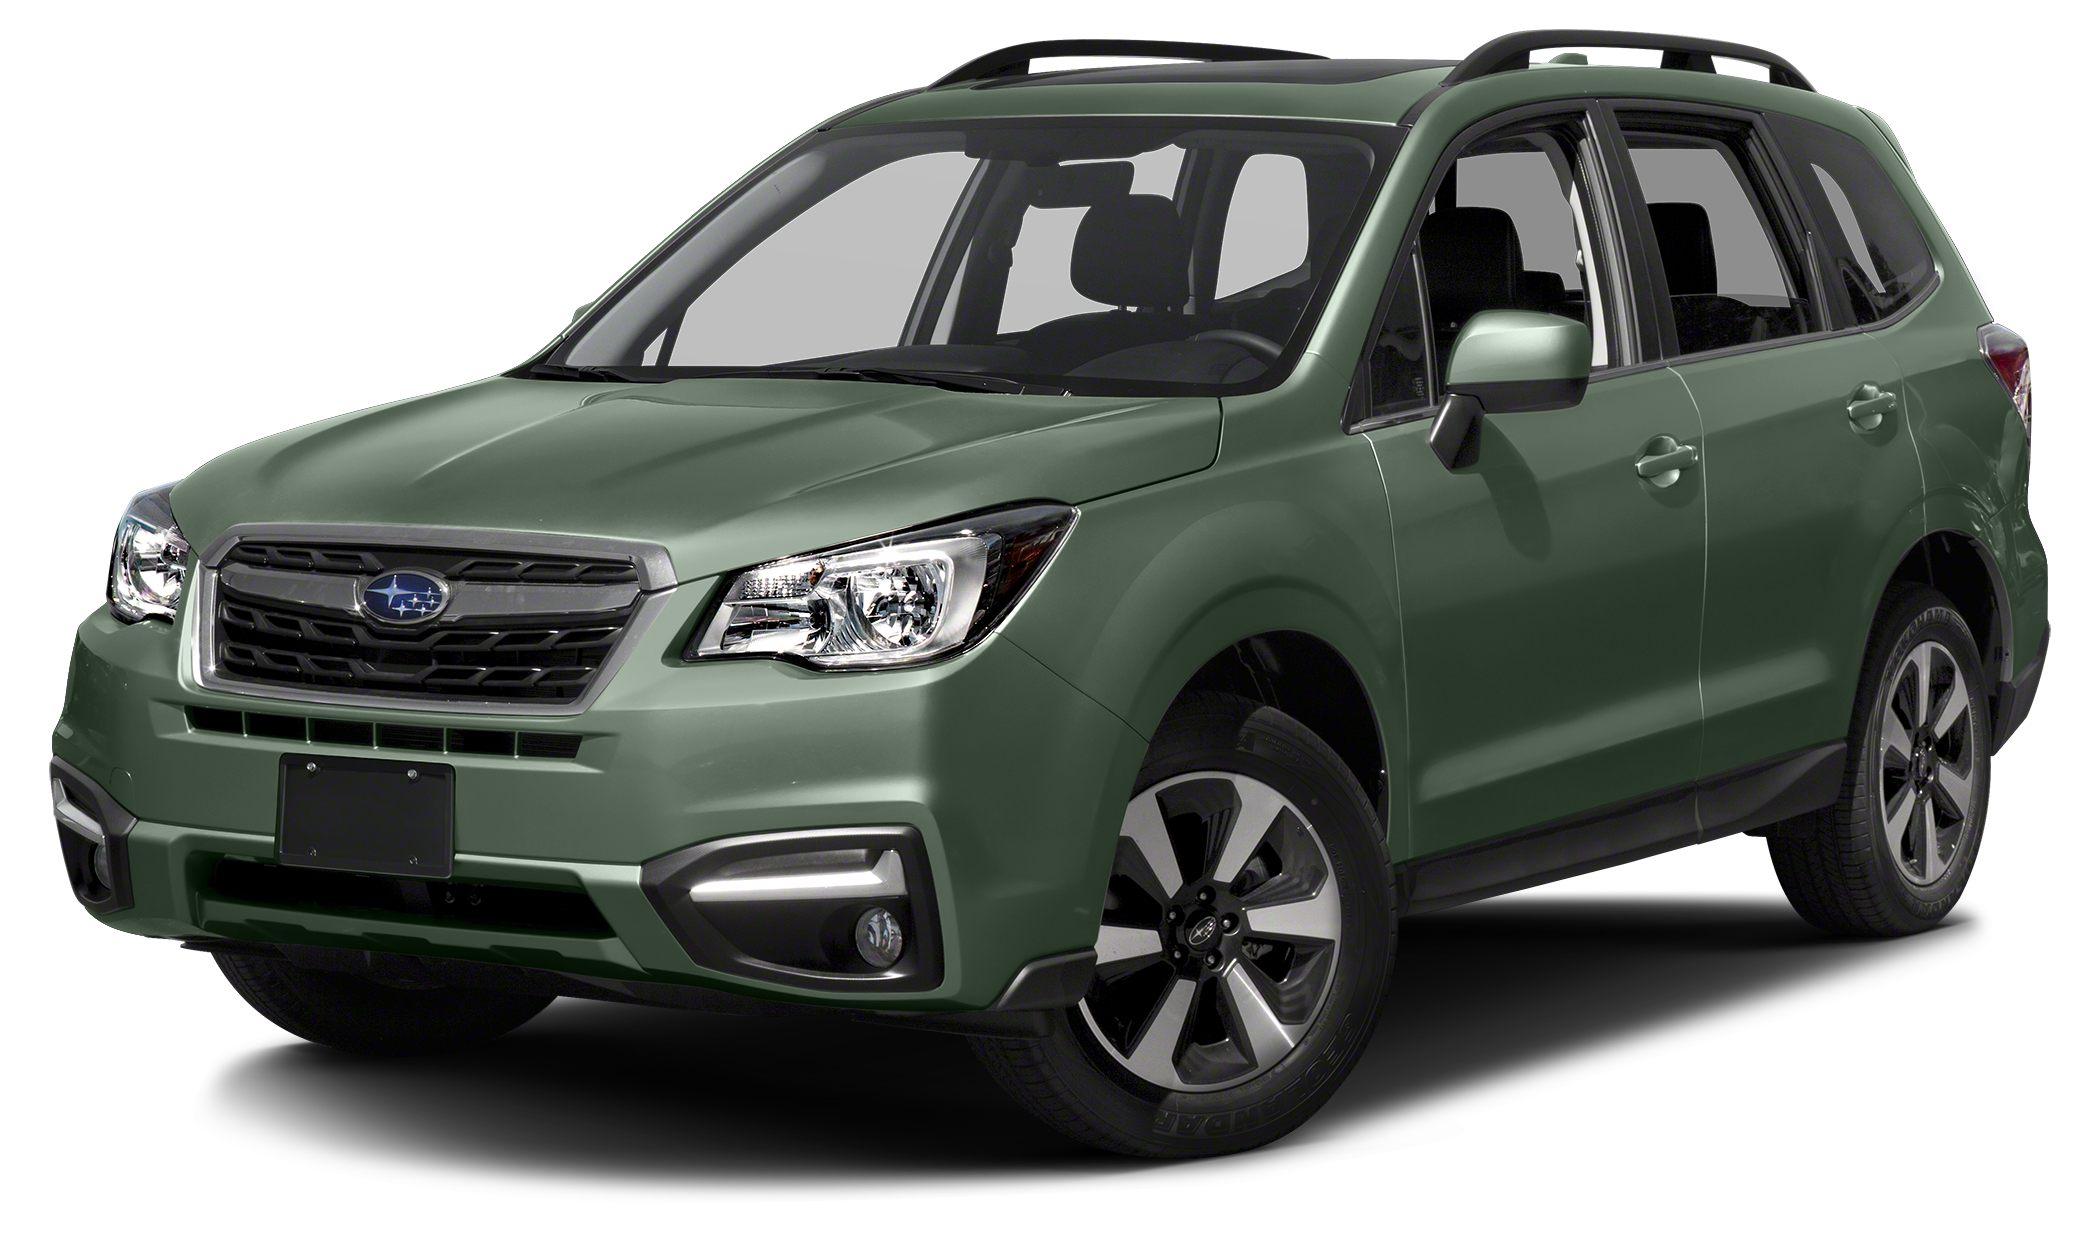 2017 Subaru Forester 25i Limited Miles 5Color Jasmine Green Metallic Stock SH563106 VIN JF2